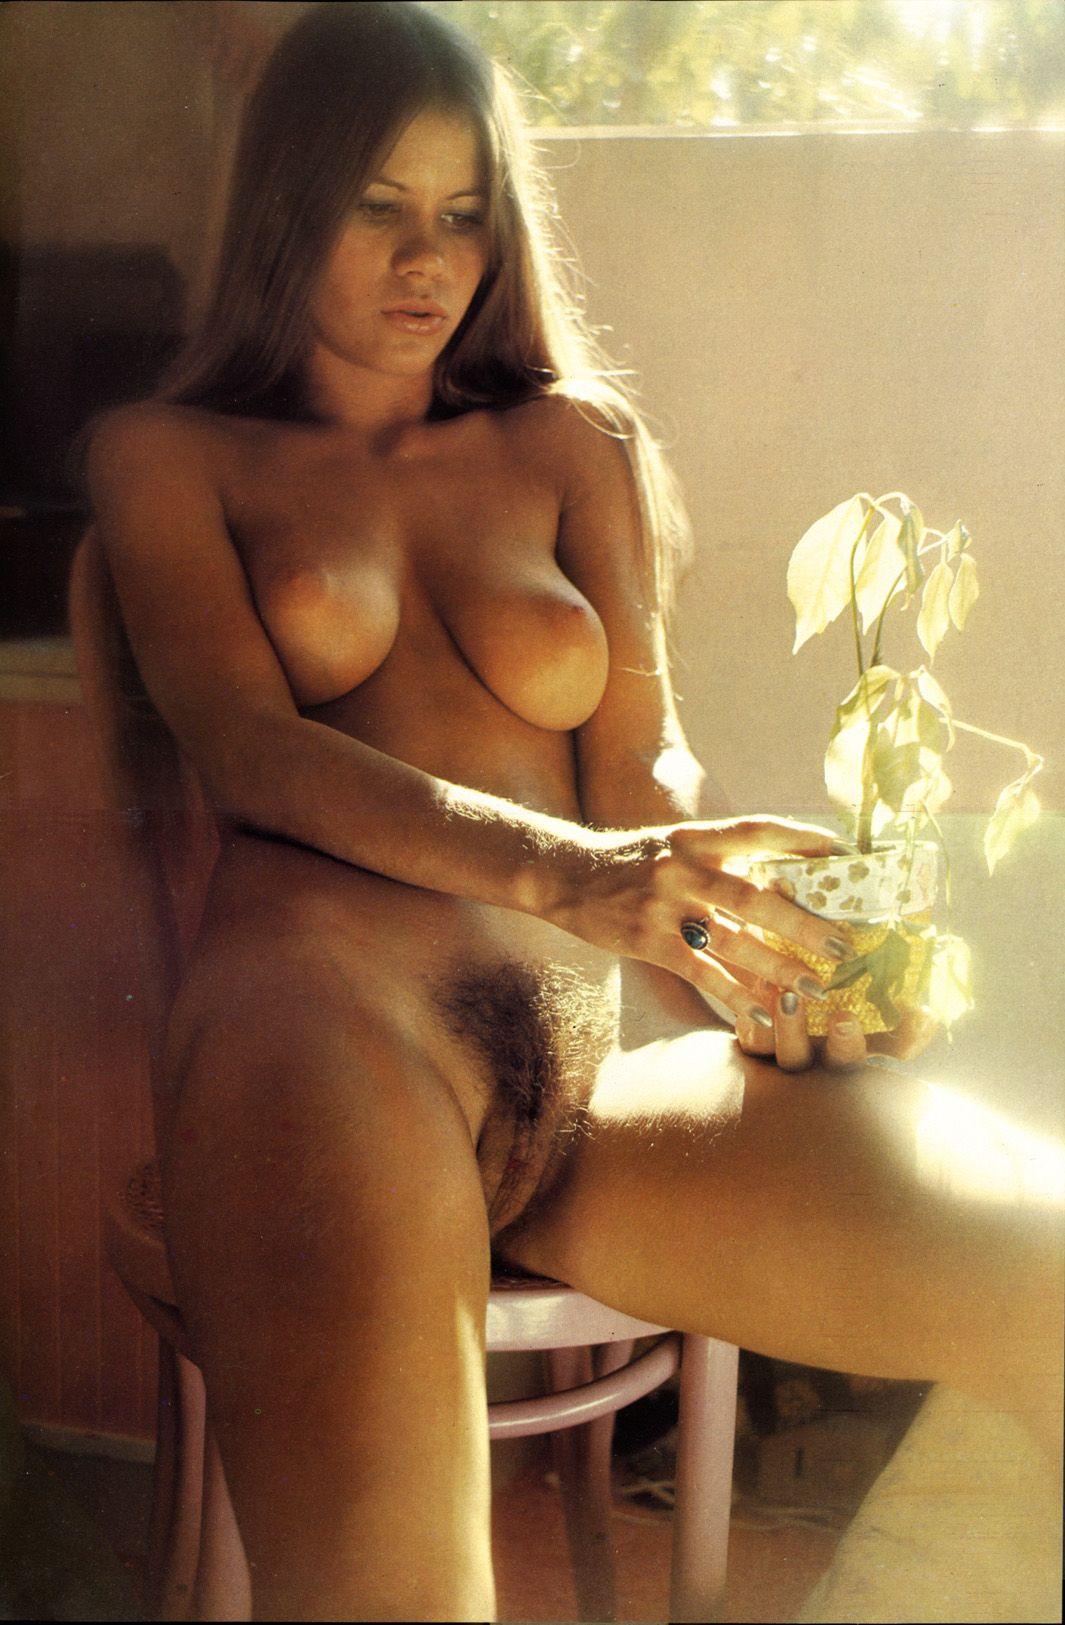 golden age porn babes : photo | manualidades | pinterest | golden age